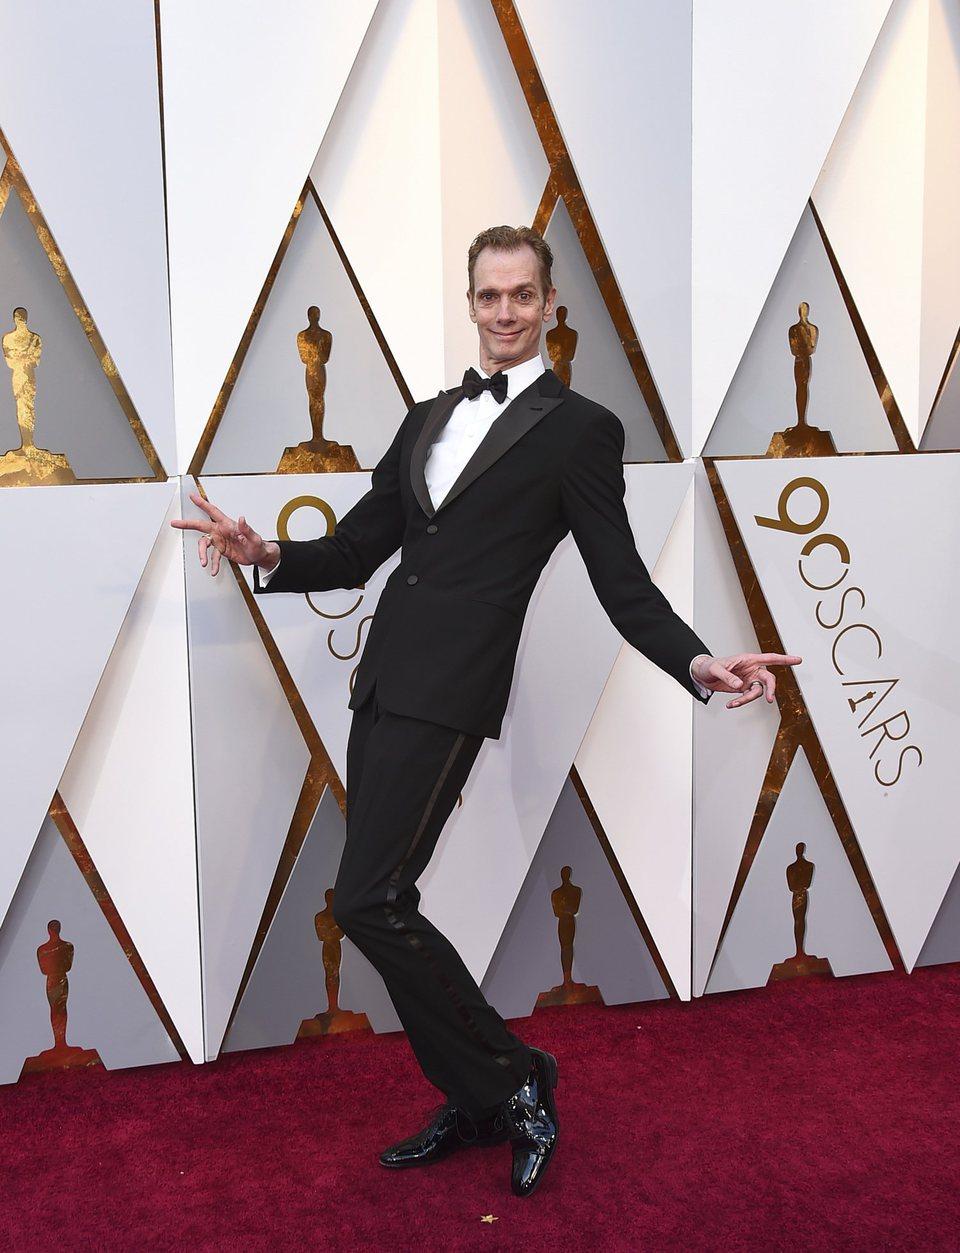 Doug Jones at the Oscars 2018 red carpet